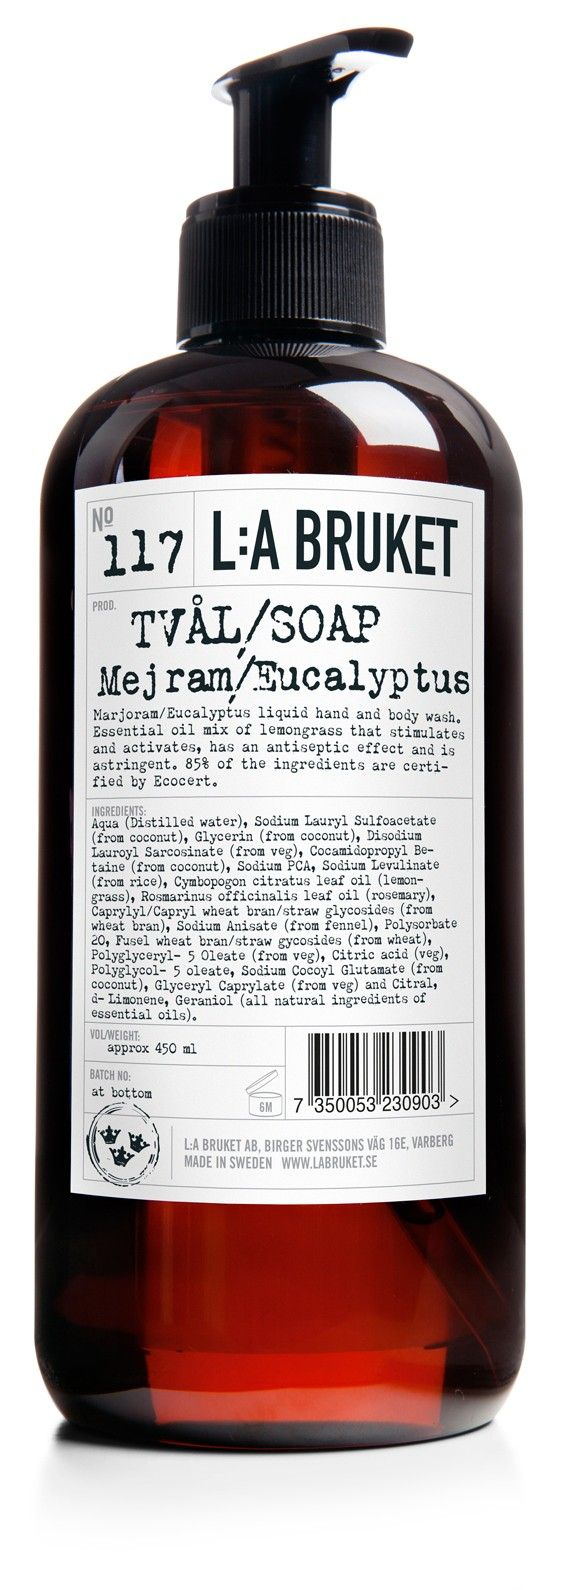 L:a Bruket Nr. 117 Flytande tvål Mejram/Eucalyptus 450ml - Eko | Fina Mig